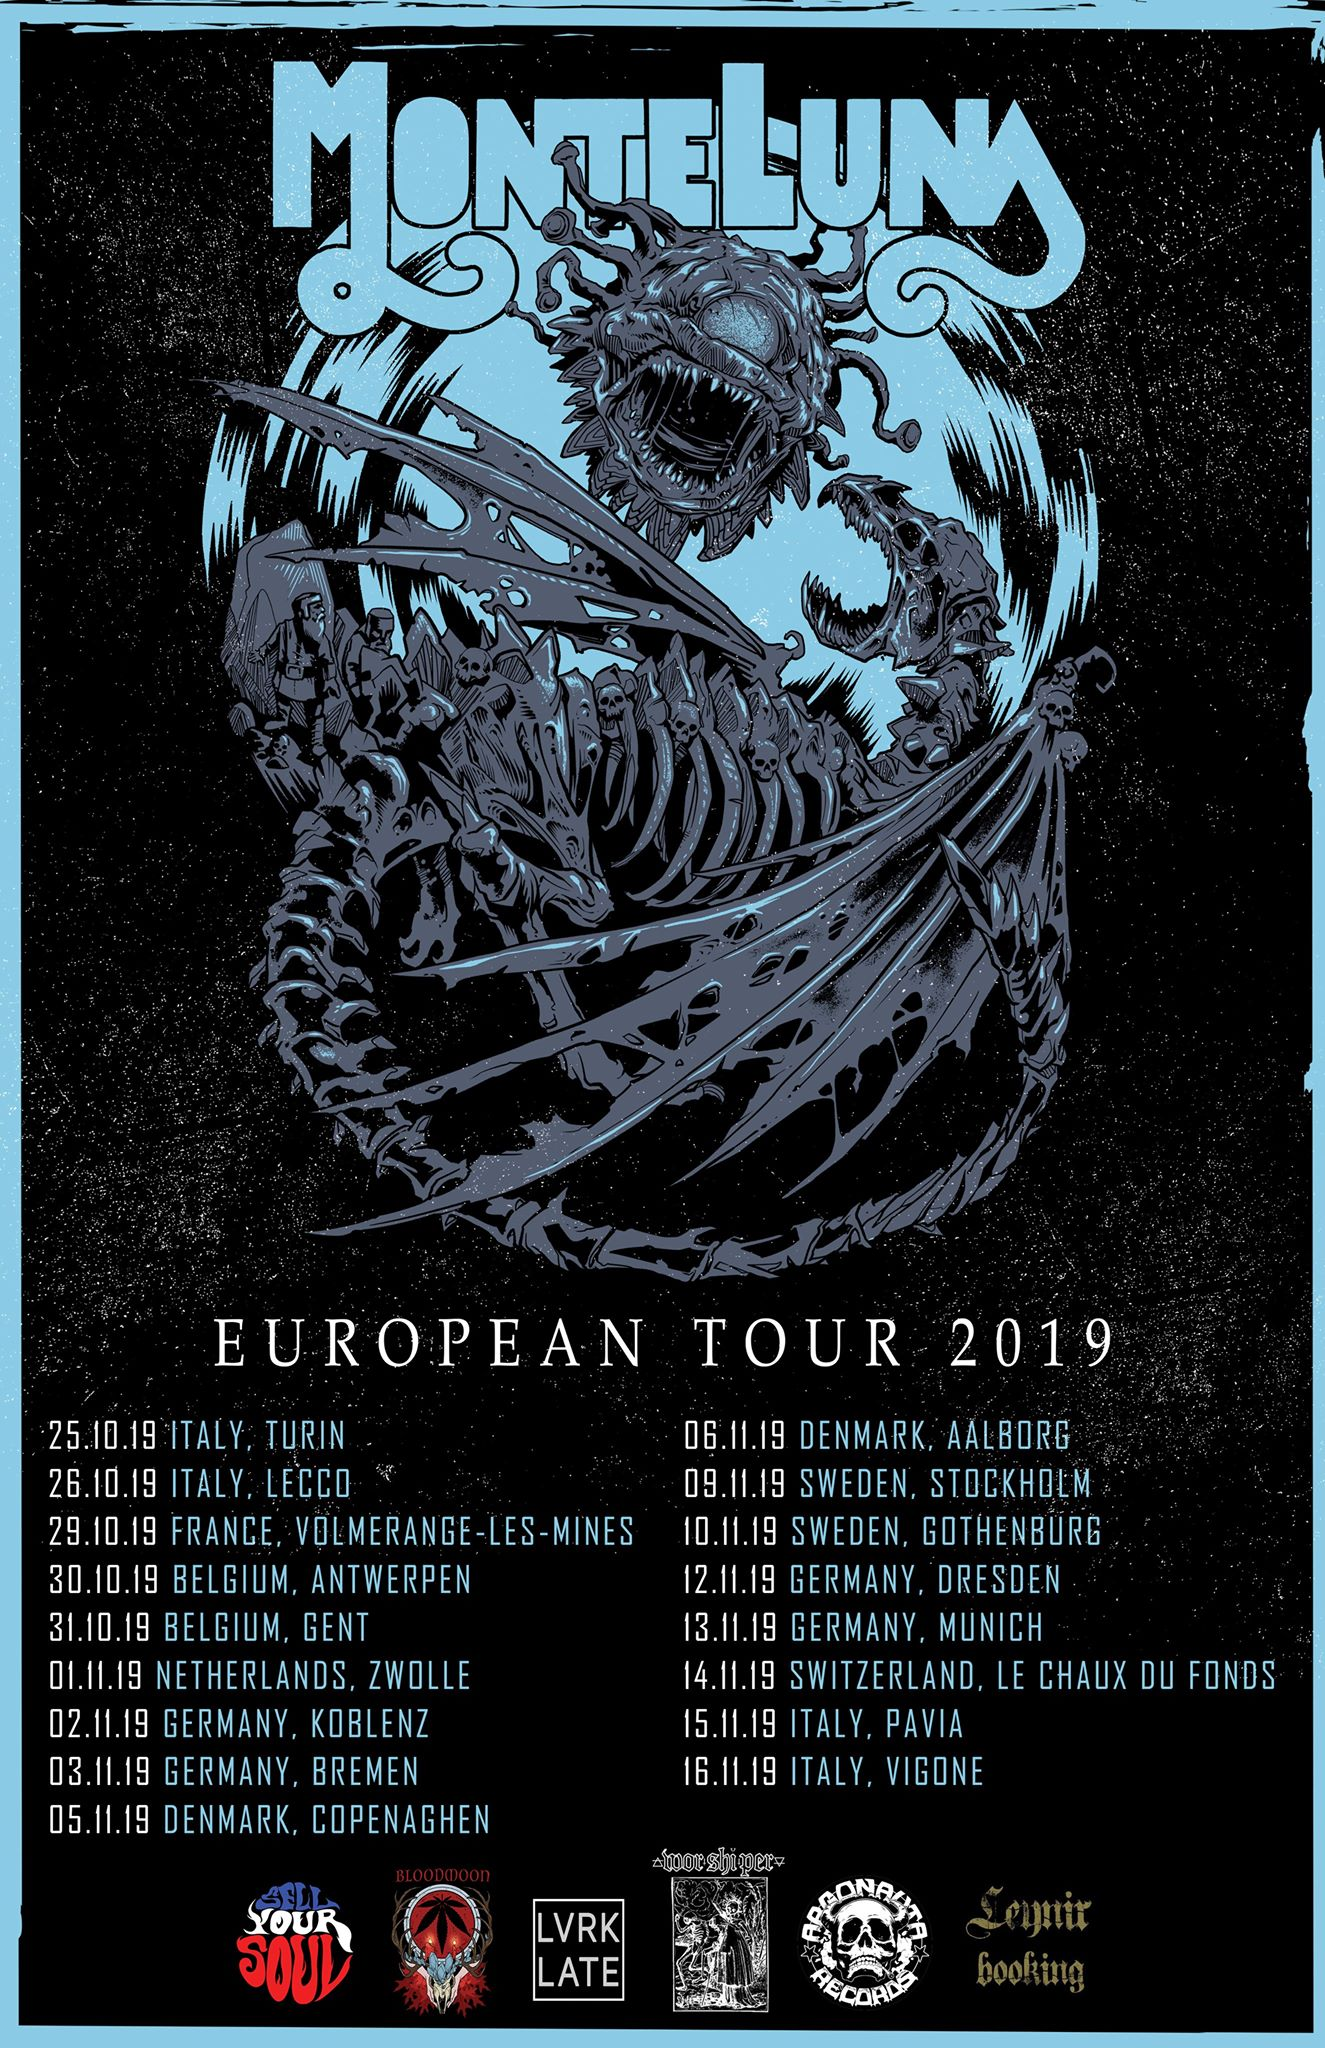 monte luna euro tour